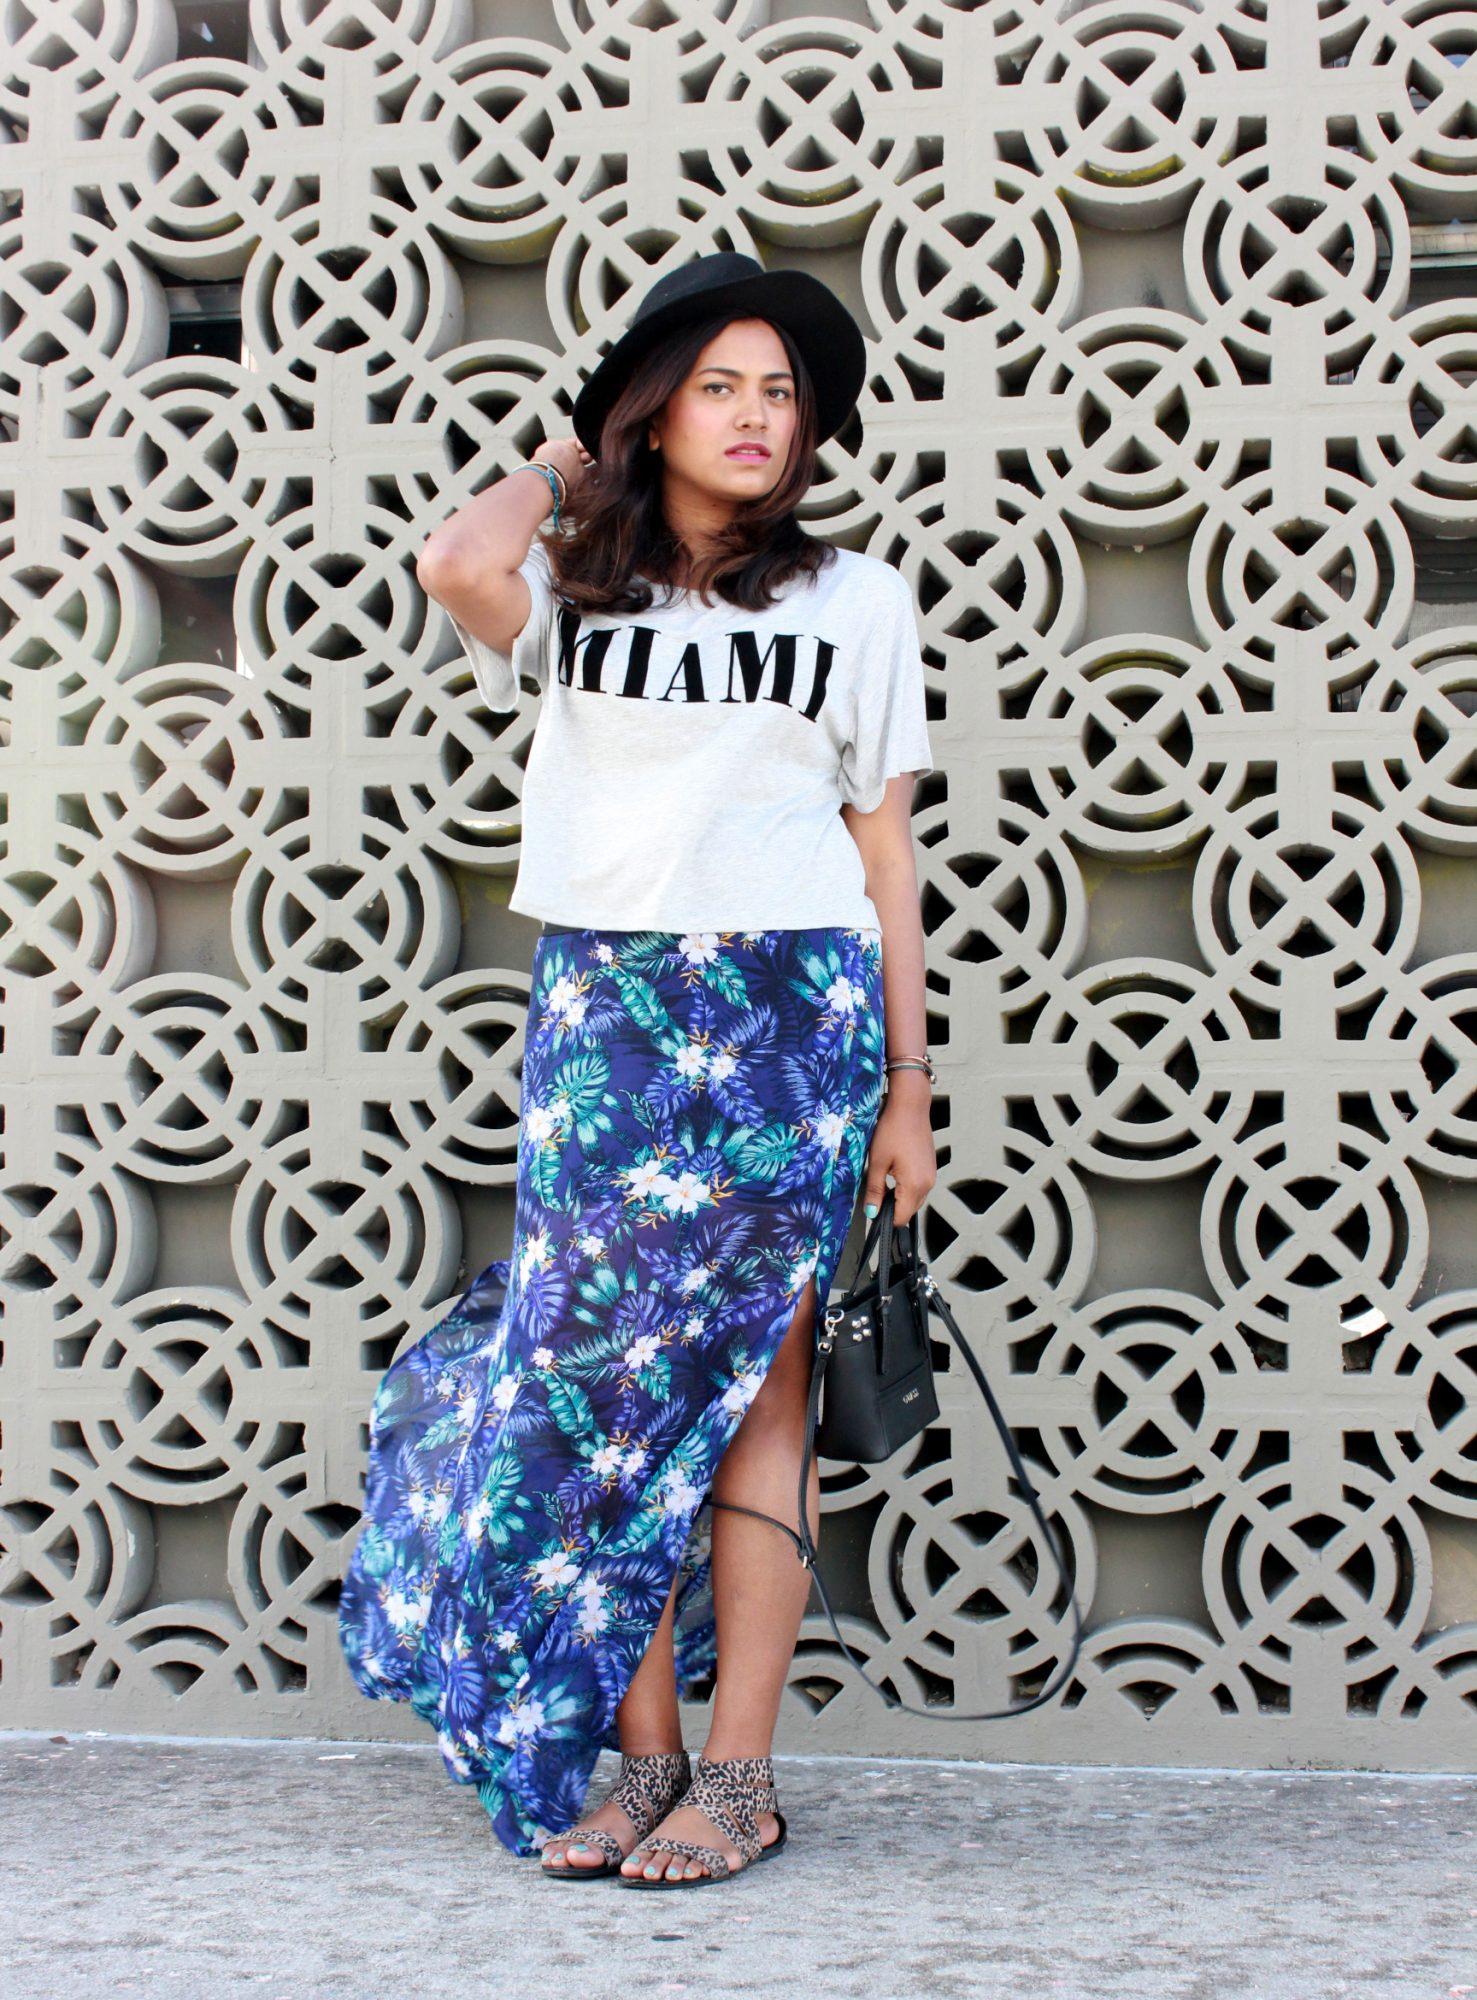 Miami Fashion Influencer Chic Stylista